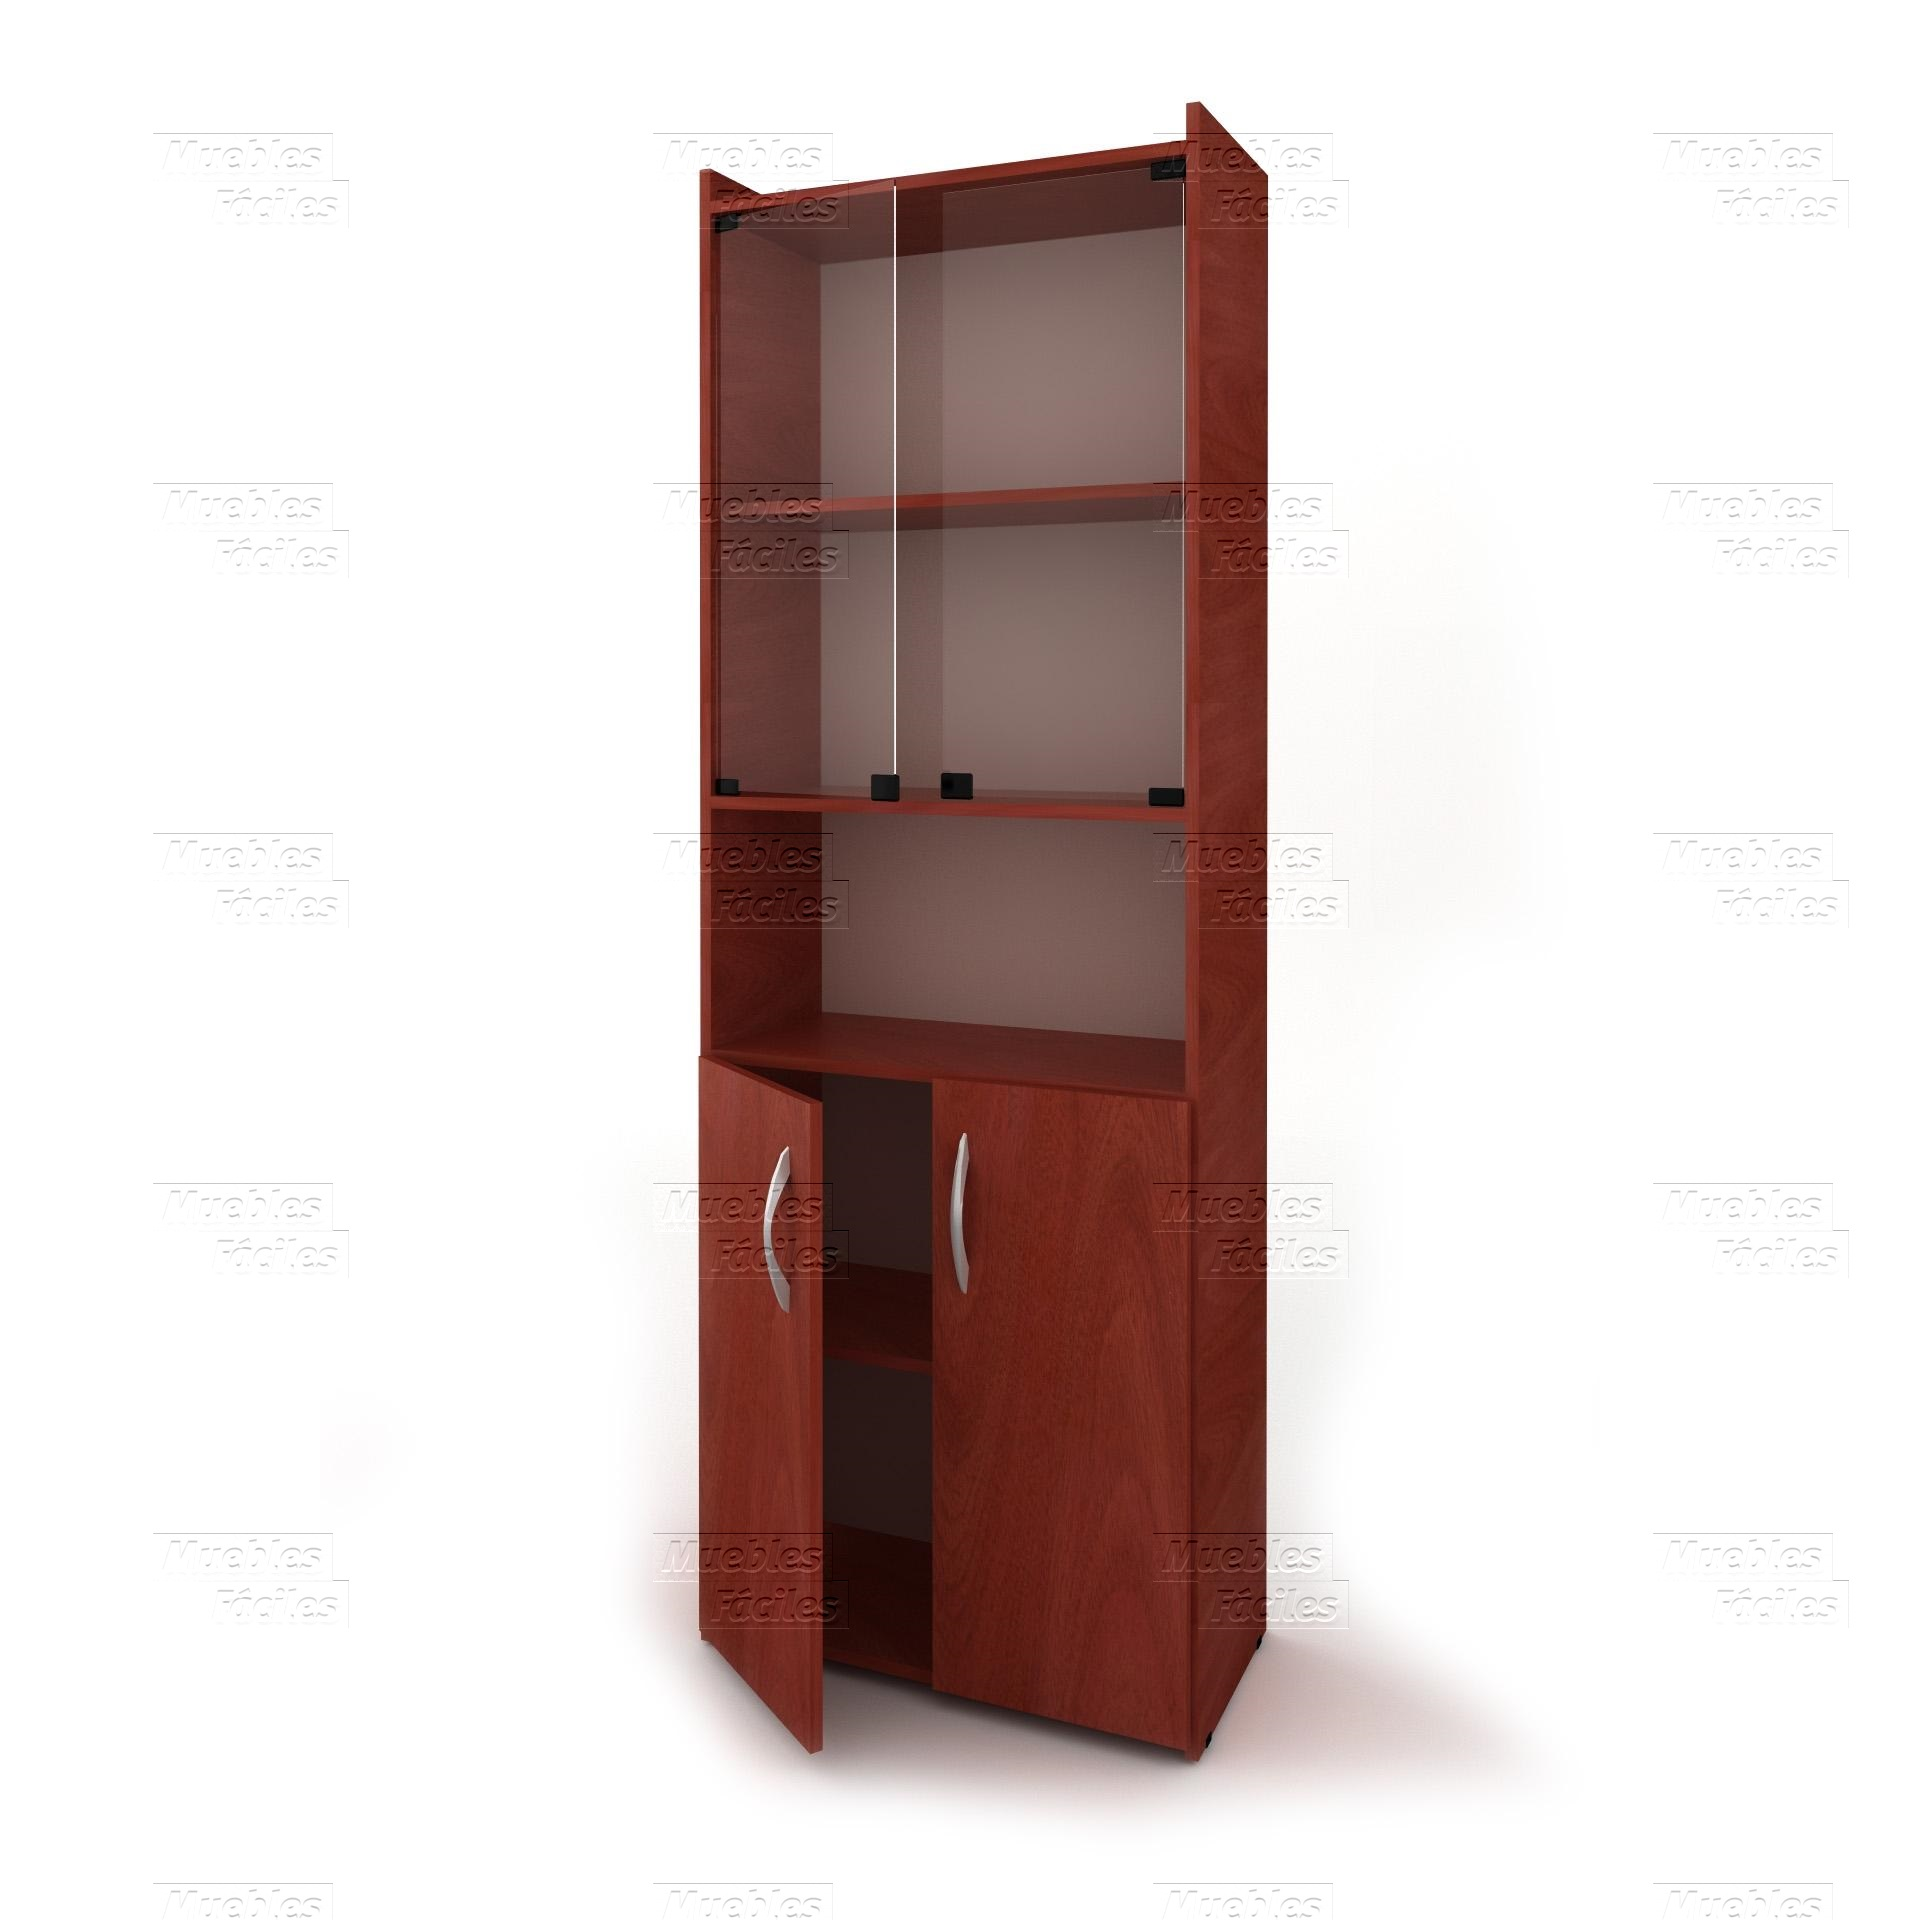 Muebles F Ciles Productos De Living Comedor Bibliotecas  # Muebles Bibliotecas Para Living